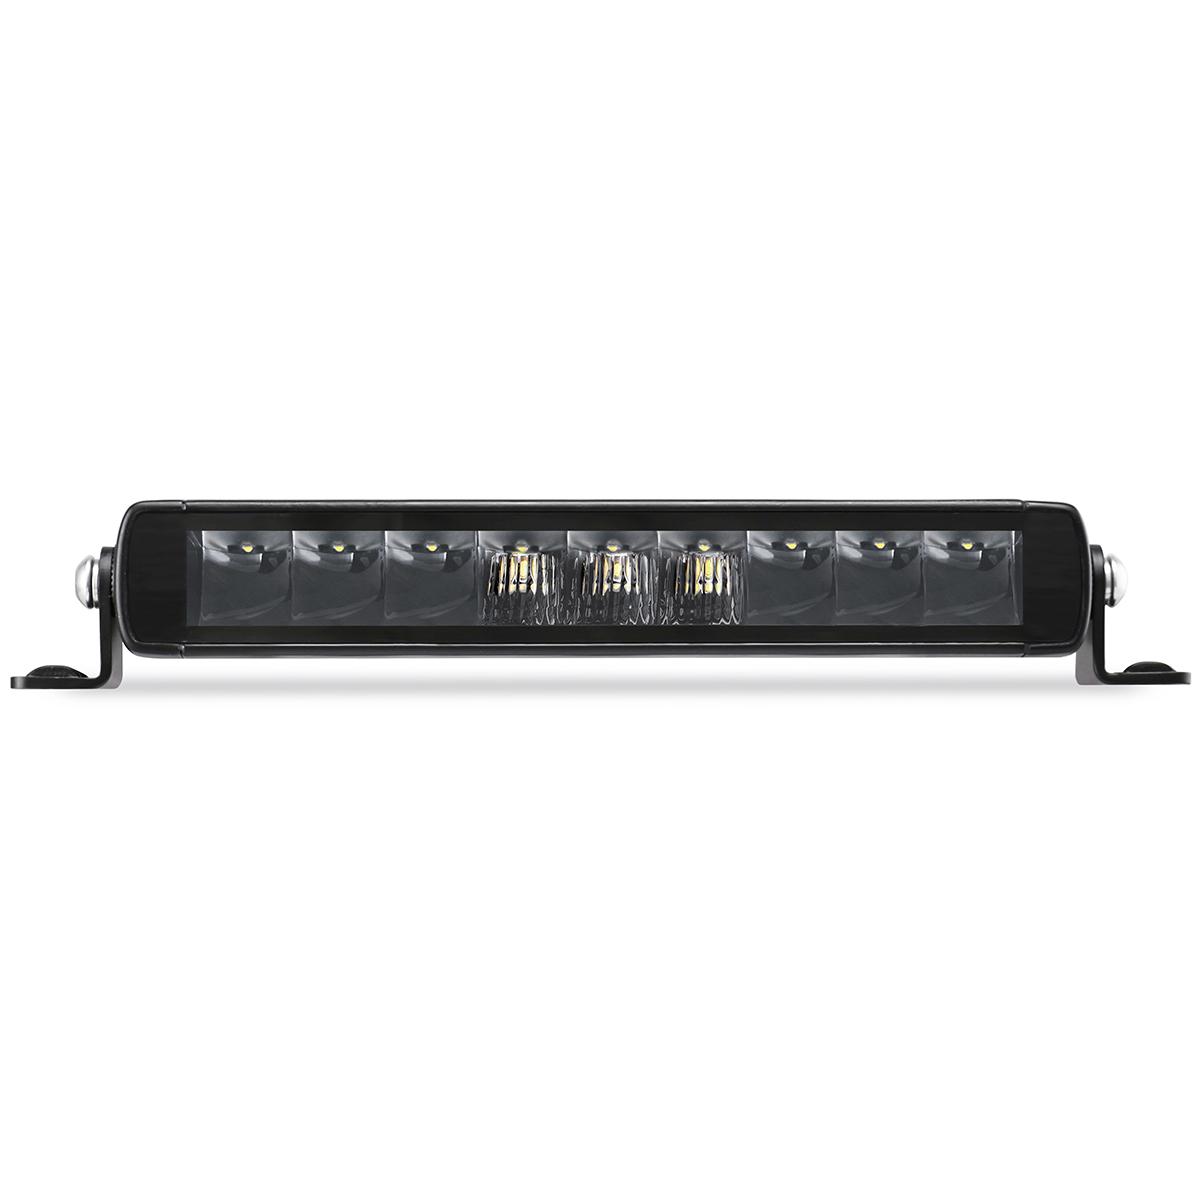 "SHARK LED Light Bar EU homologated OSRAM CSHP 10"""